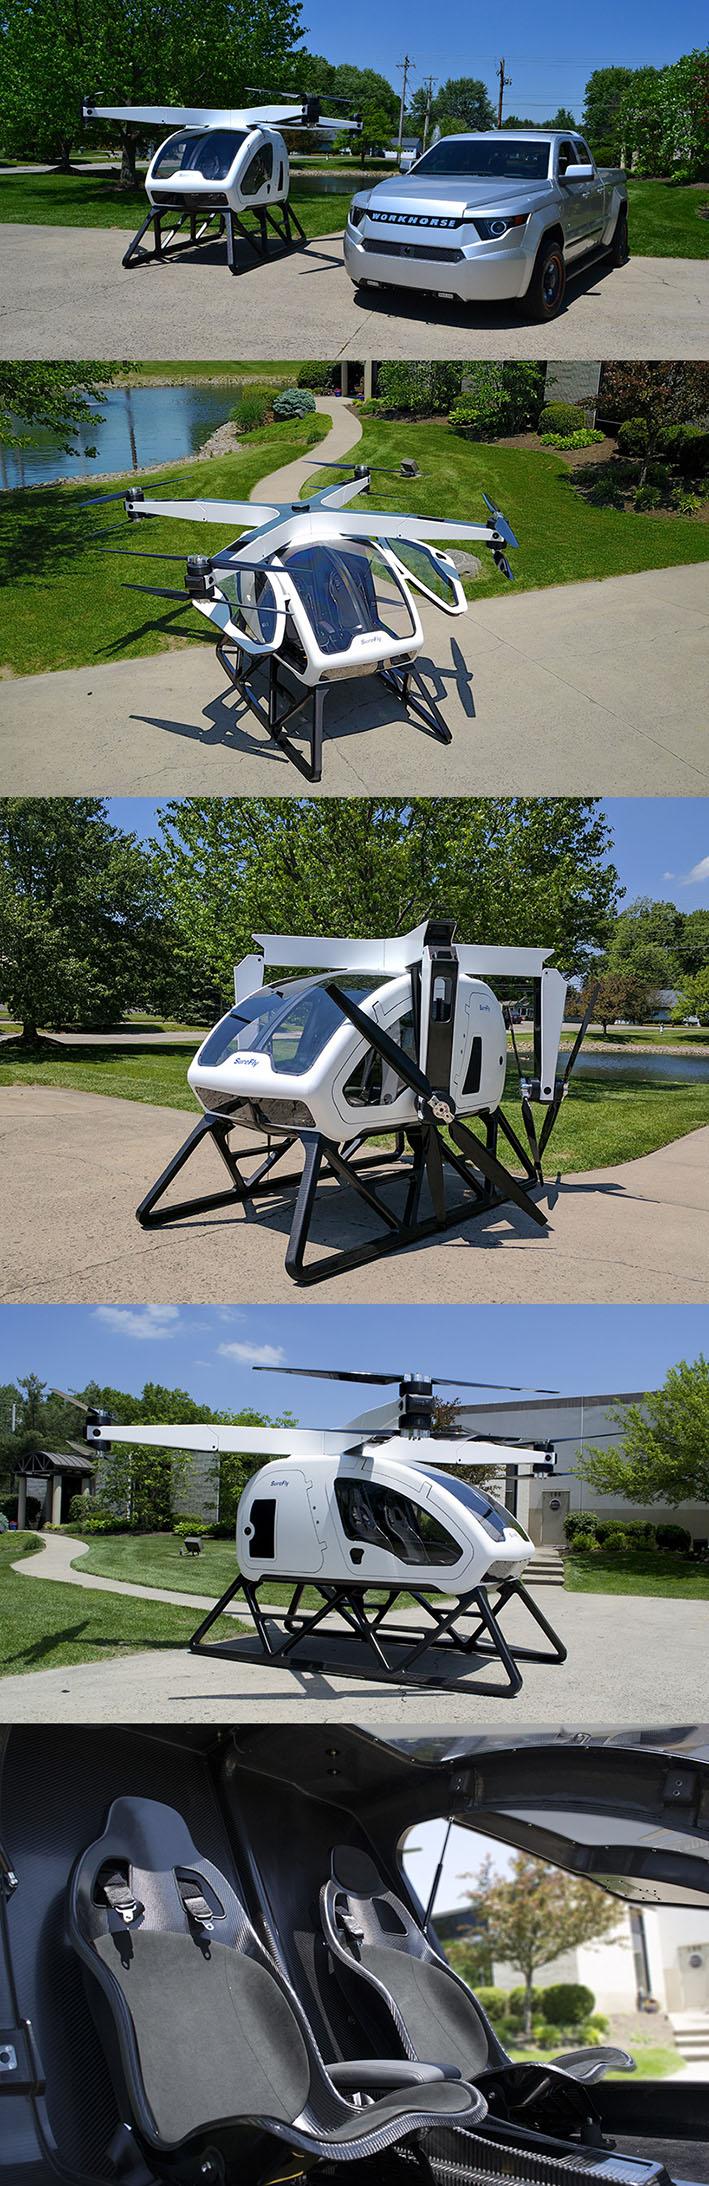 O carro voador do futuro Surefly funde helicóptero com drone stylo urbano